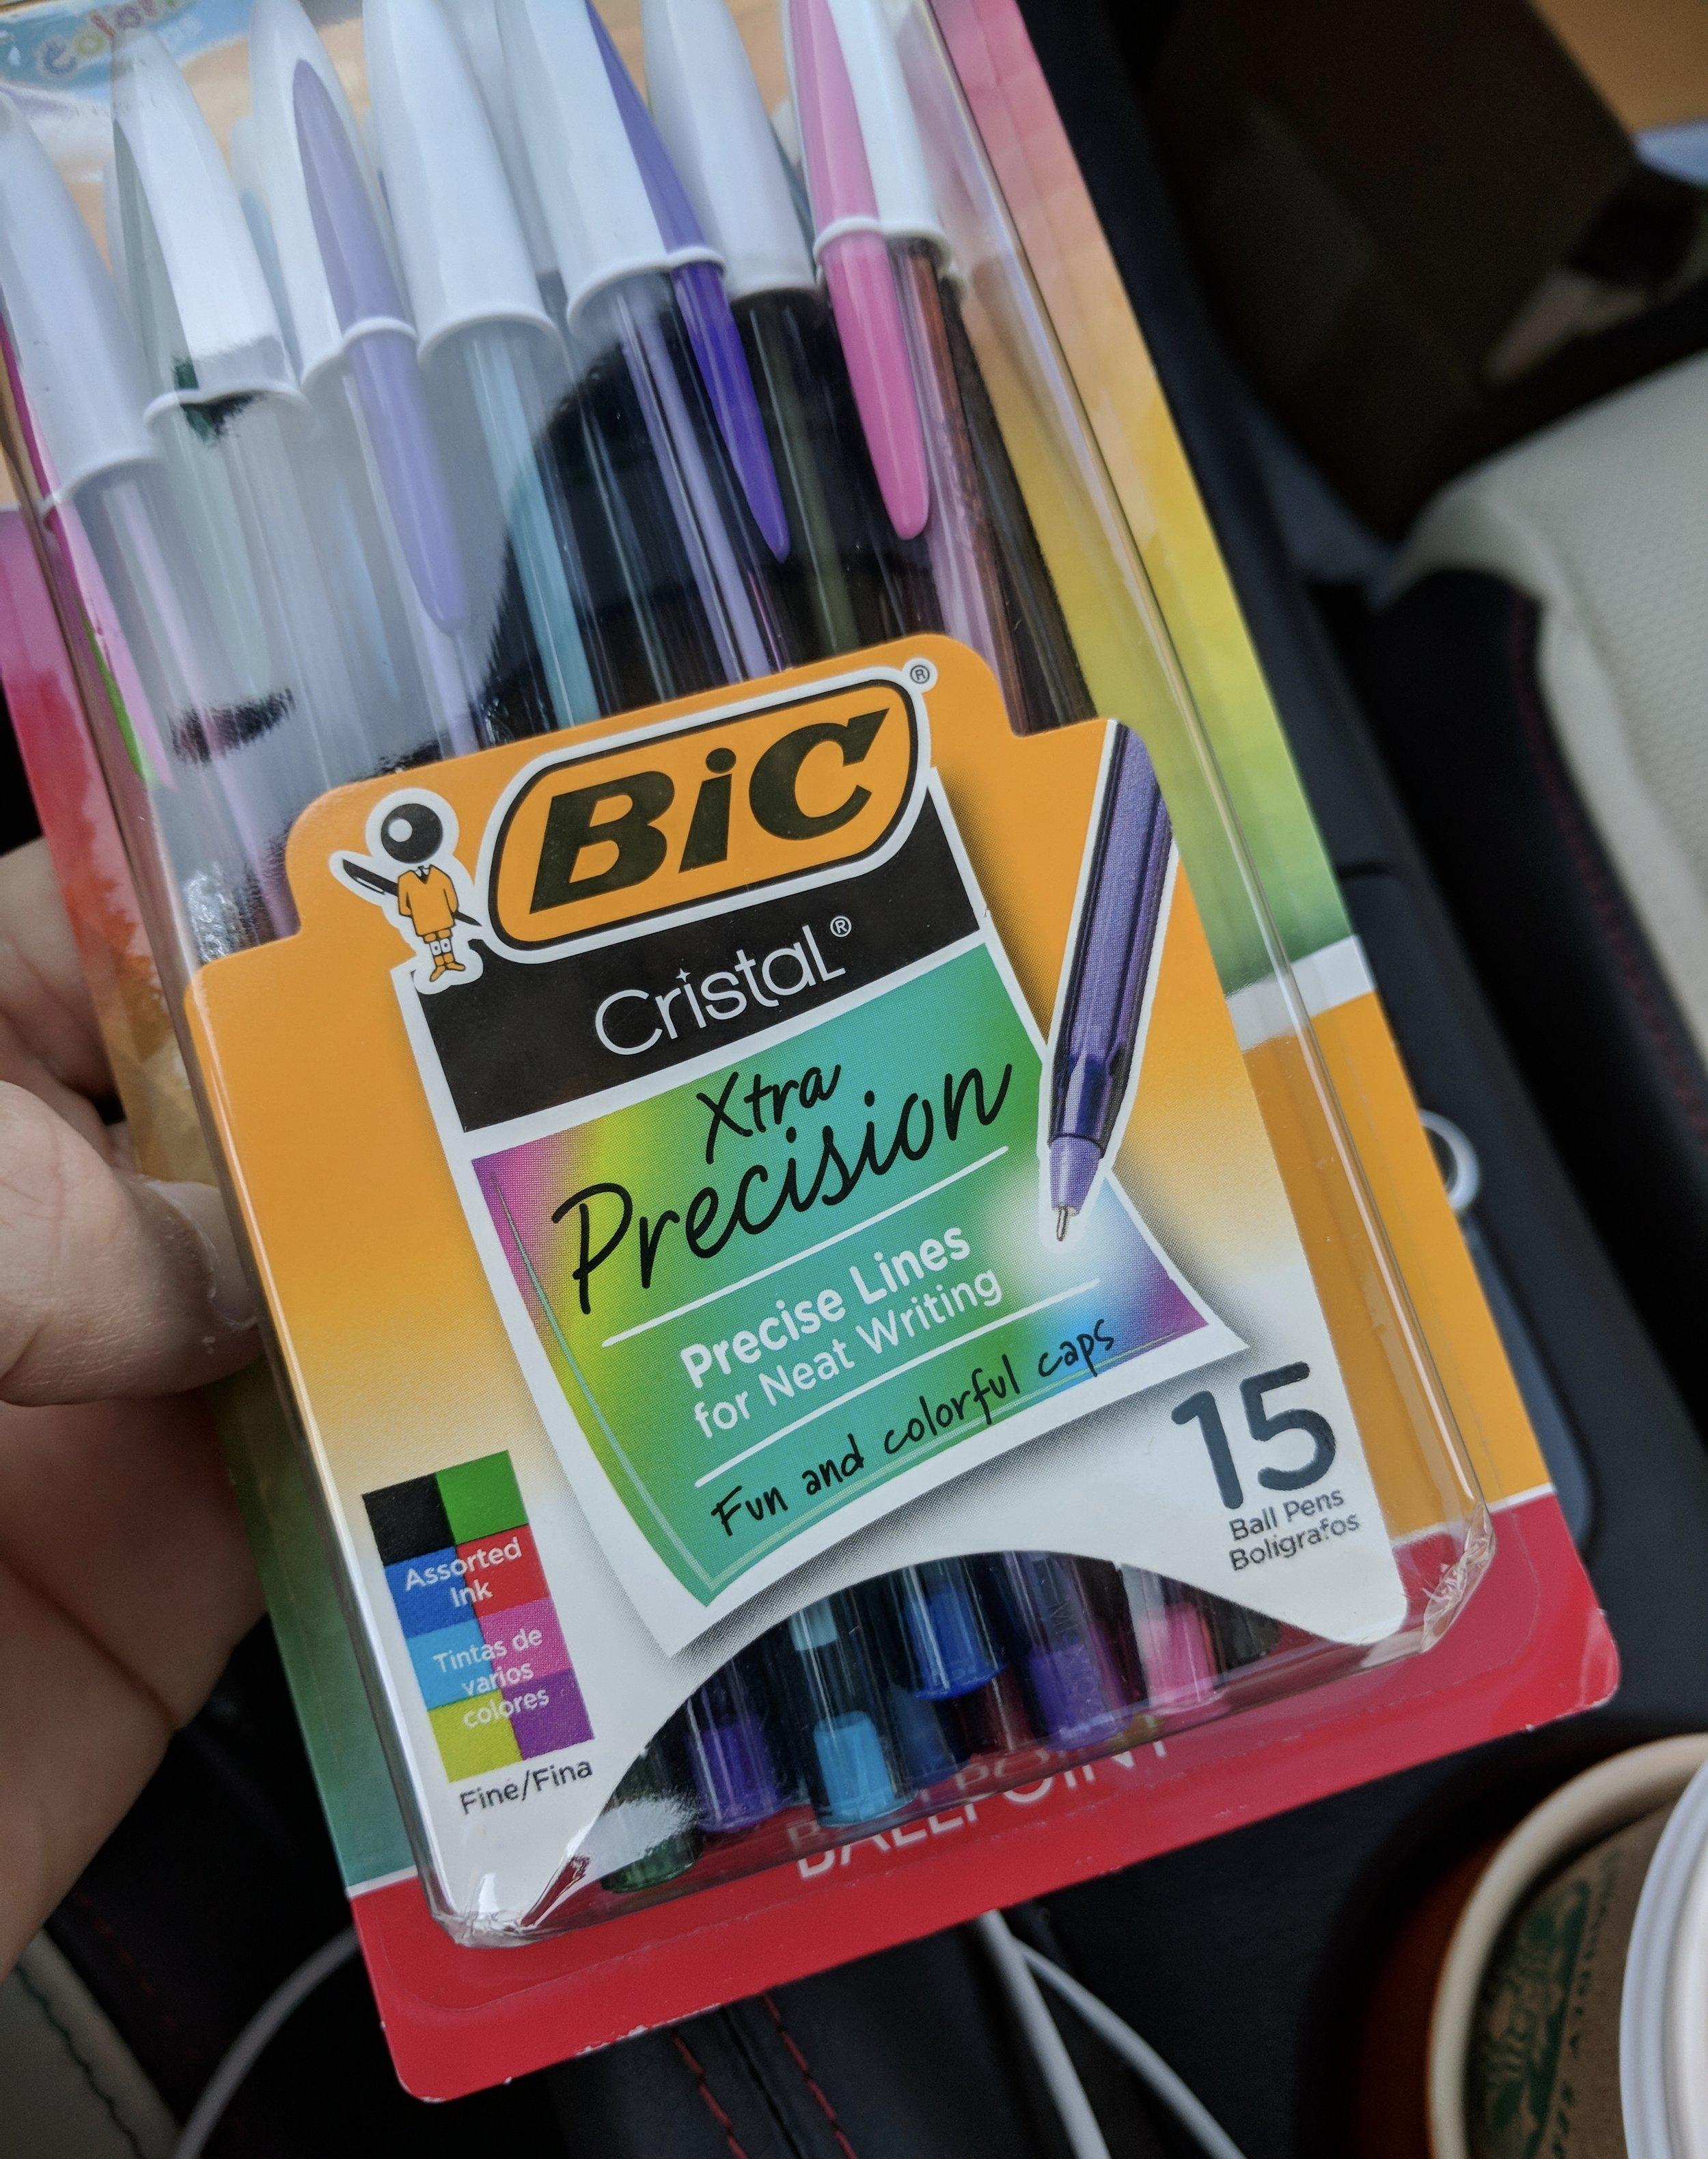 Bic-Cristal-Xtra-Precision